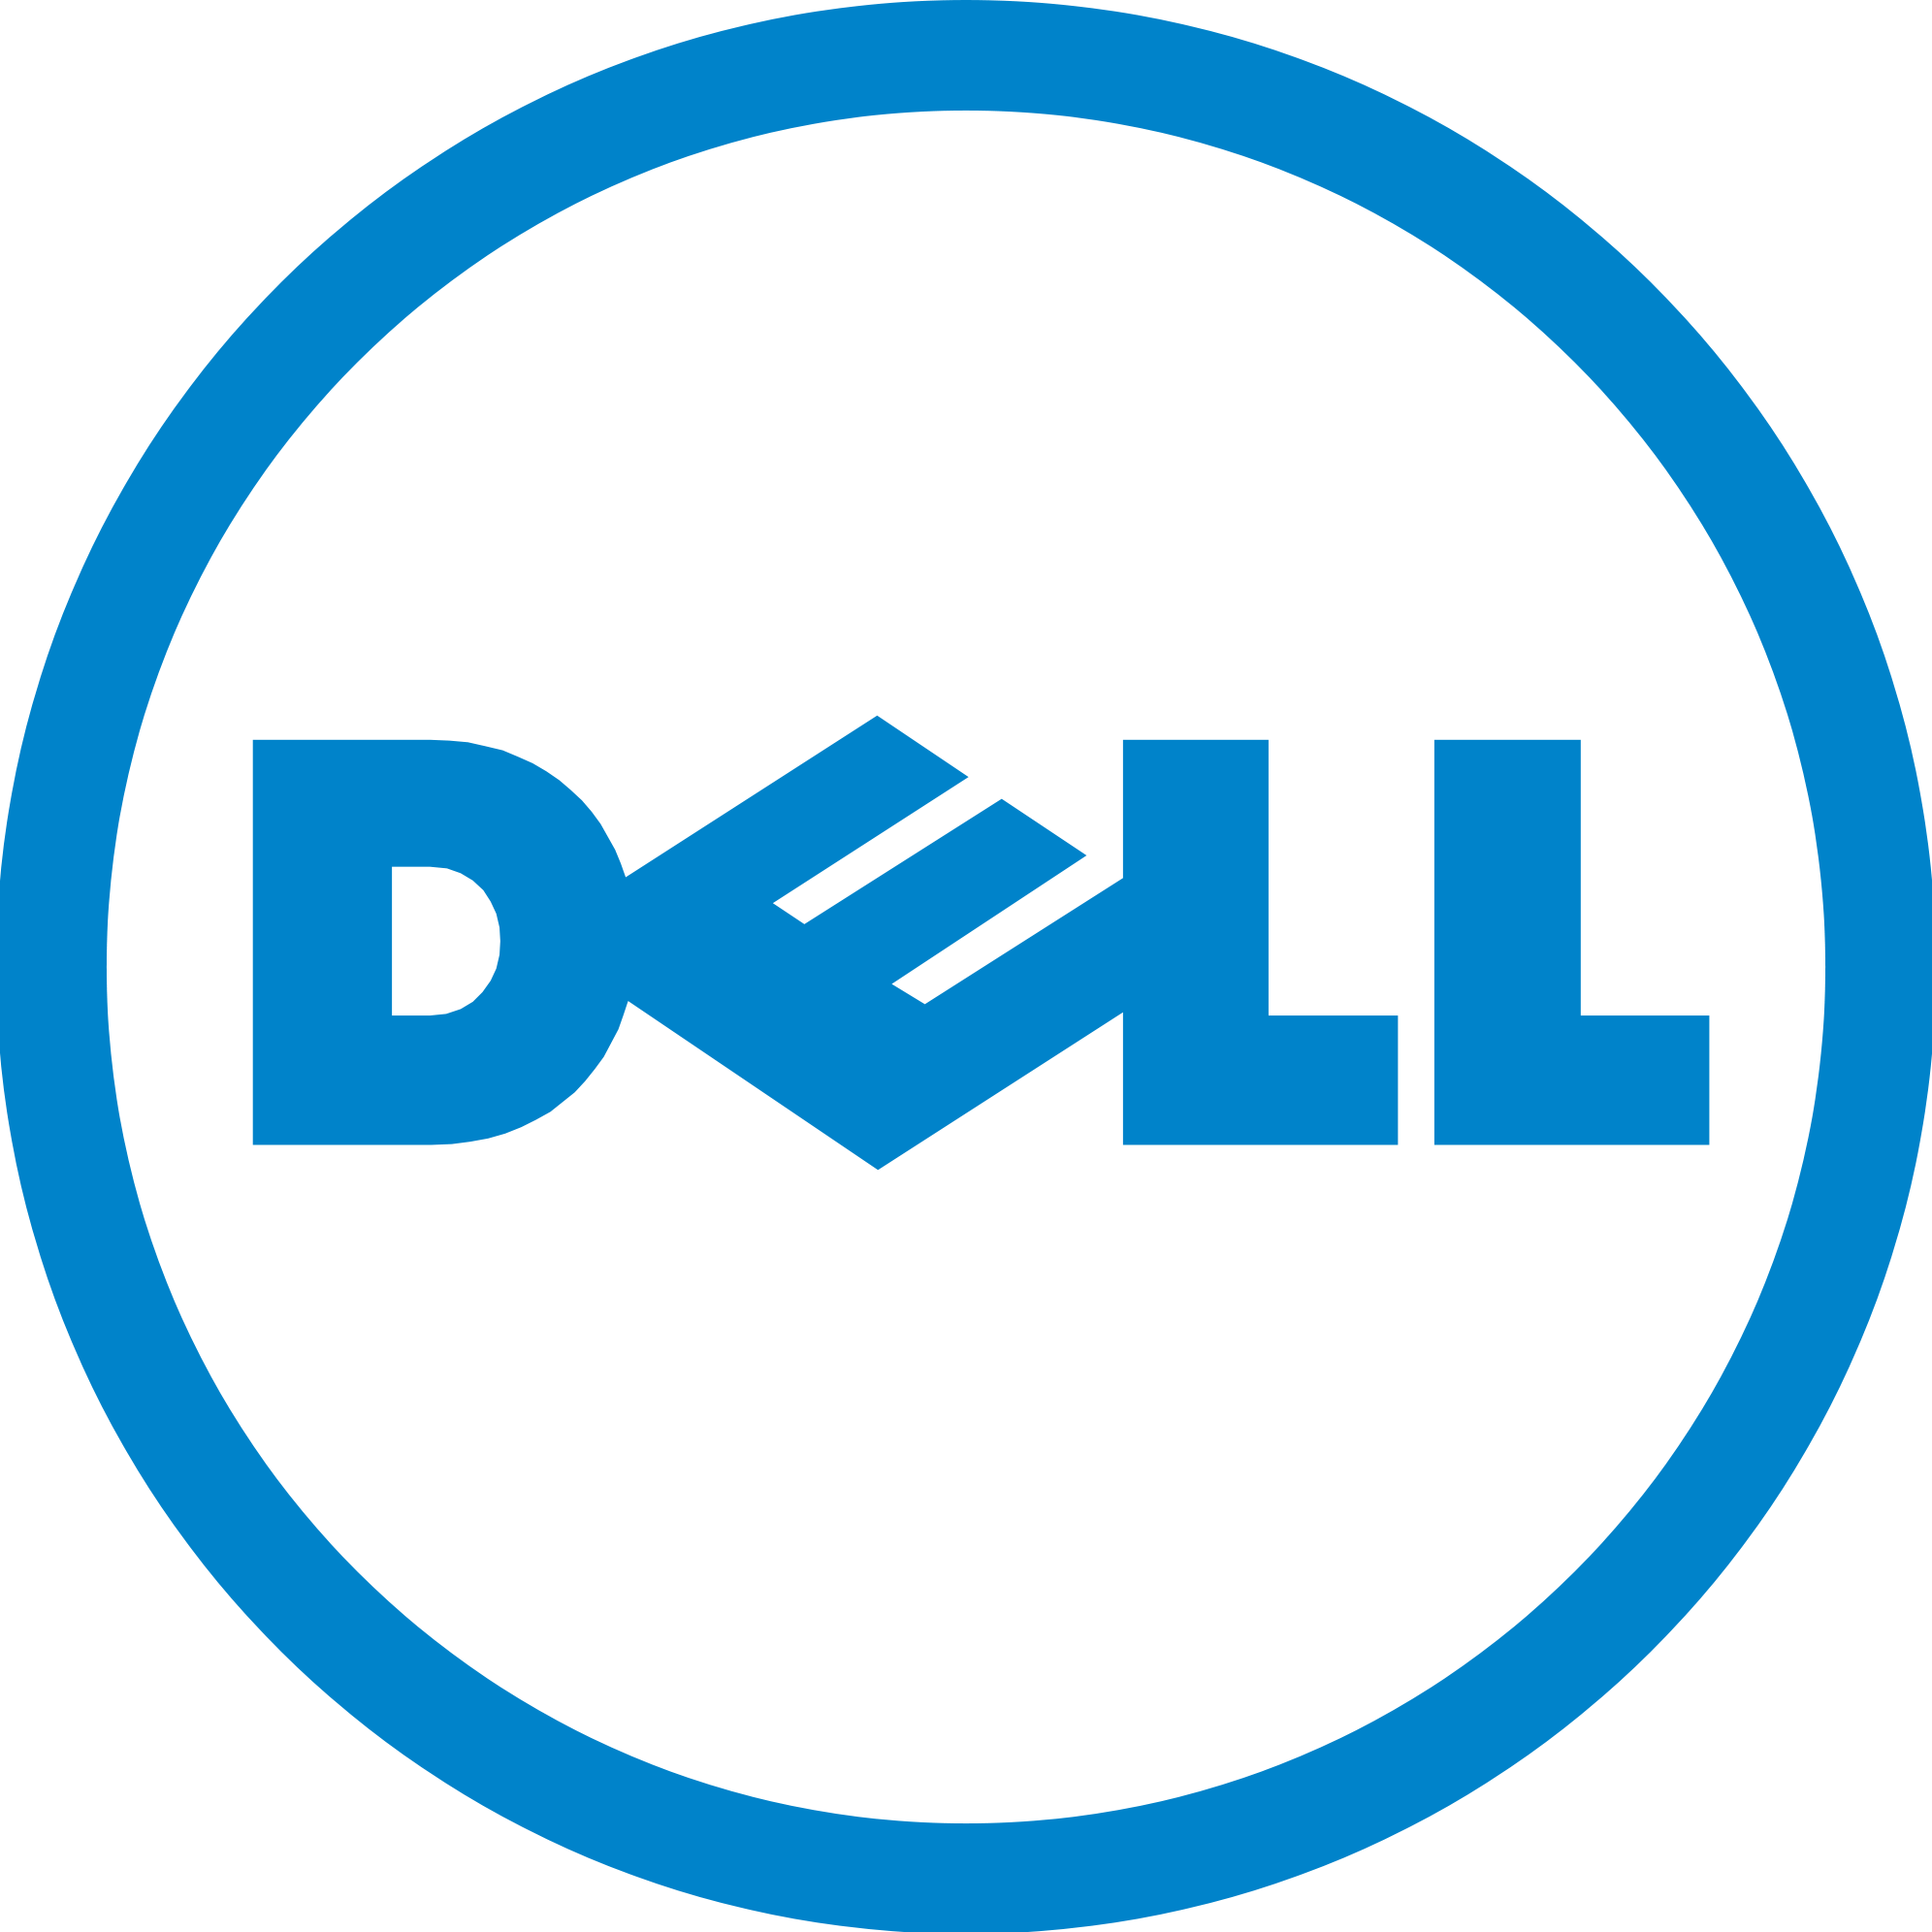 Tech Support Dell (@TechSupportDell) | Twitter